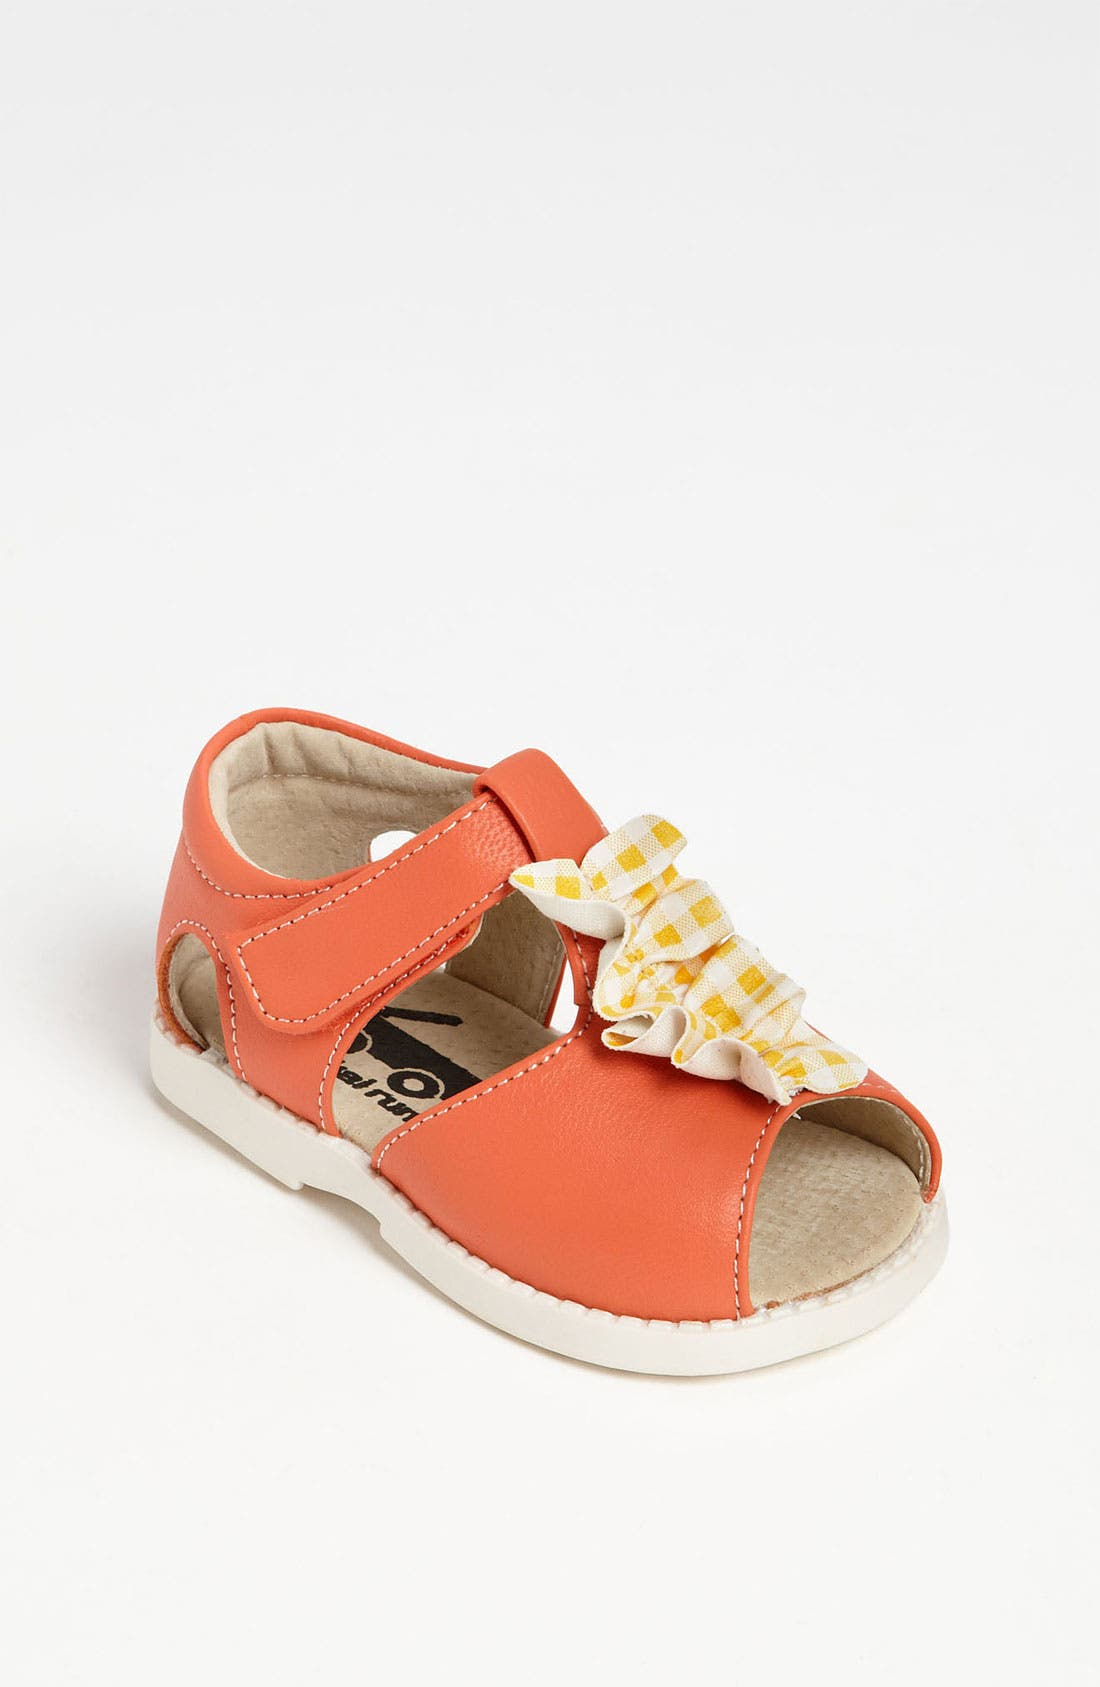 Main Image - See Kai Run 'Merrilee' Sandal (Baby, Walker & Toddler)